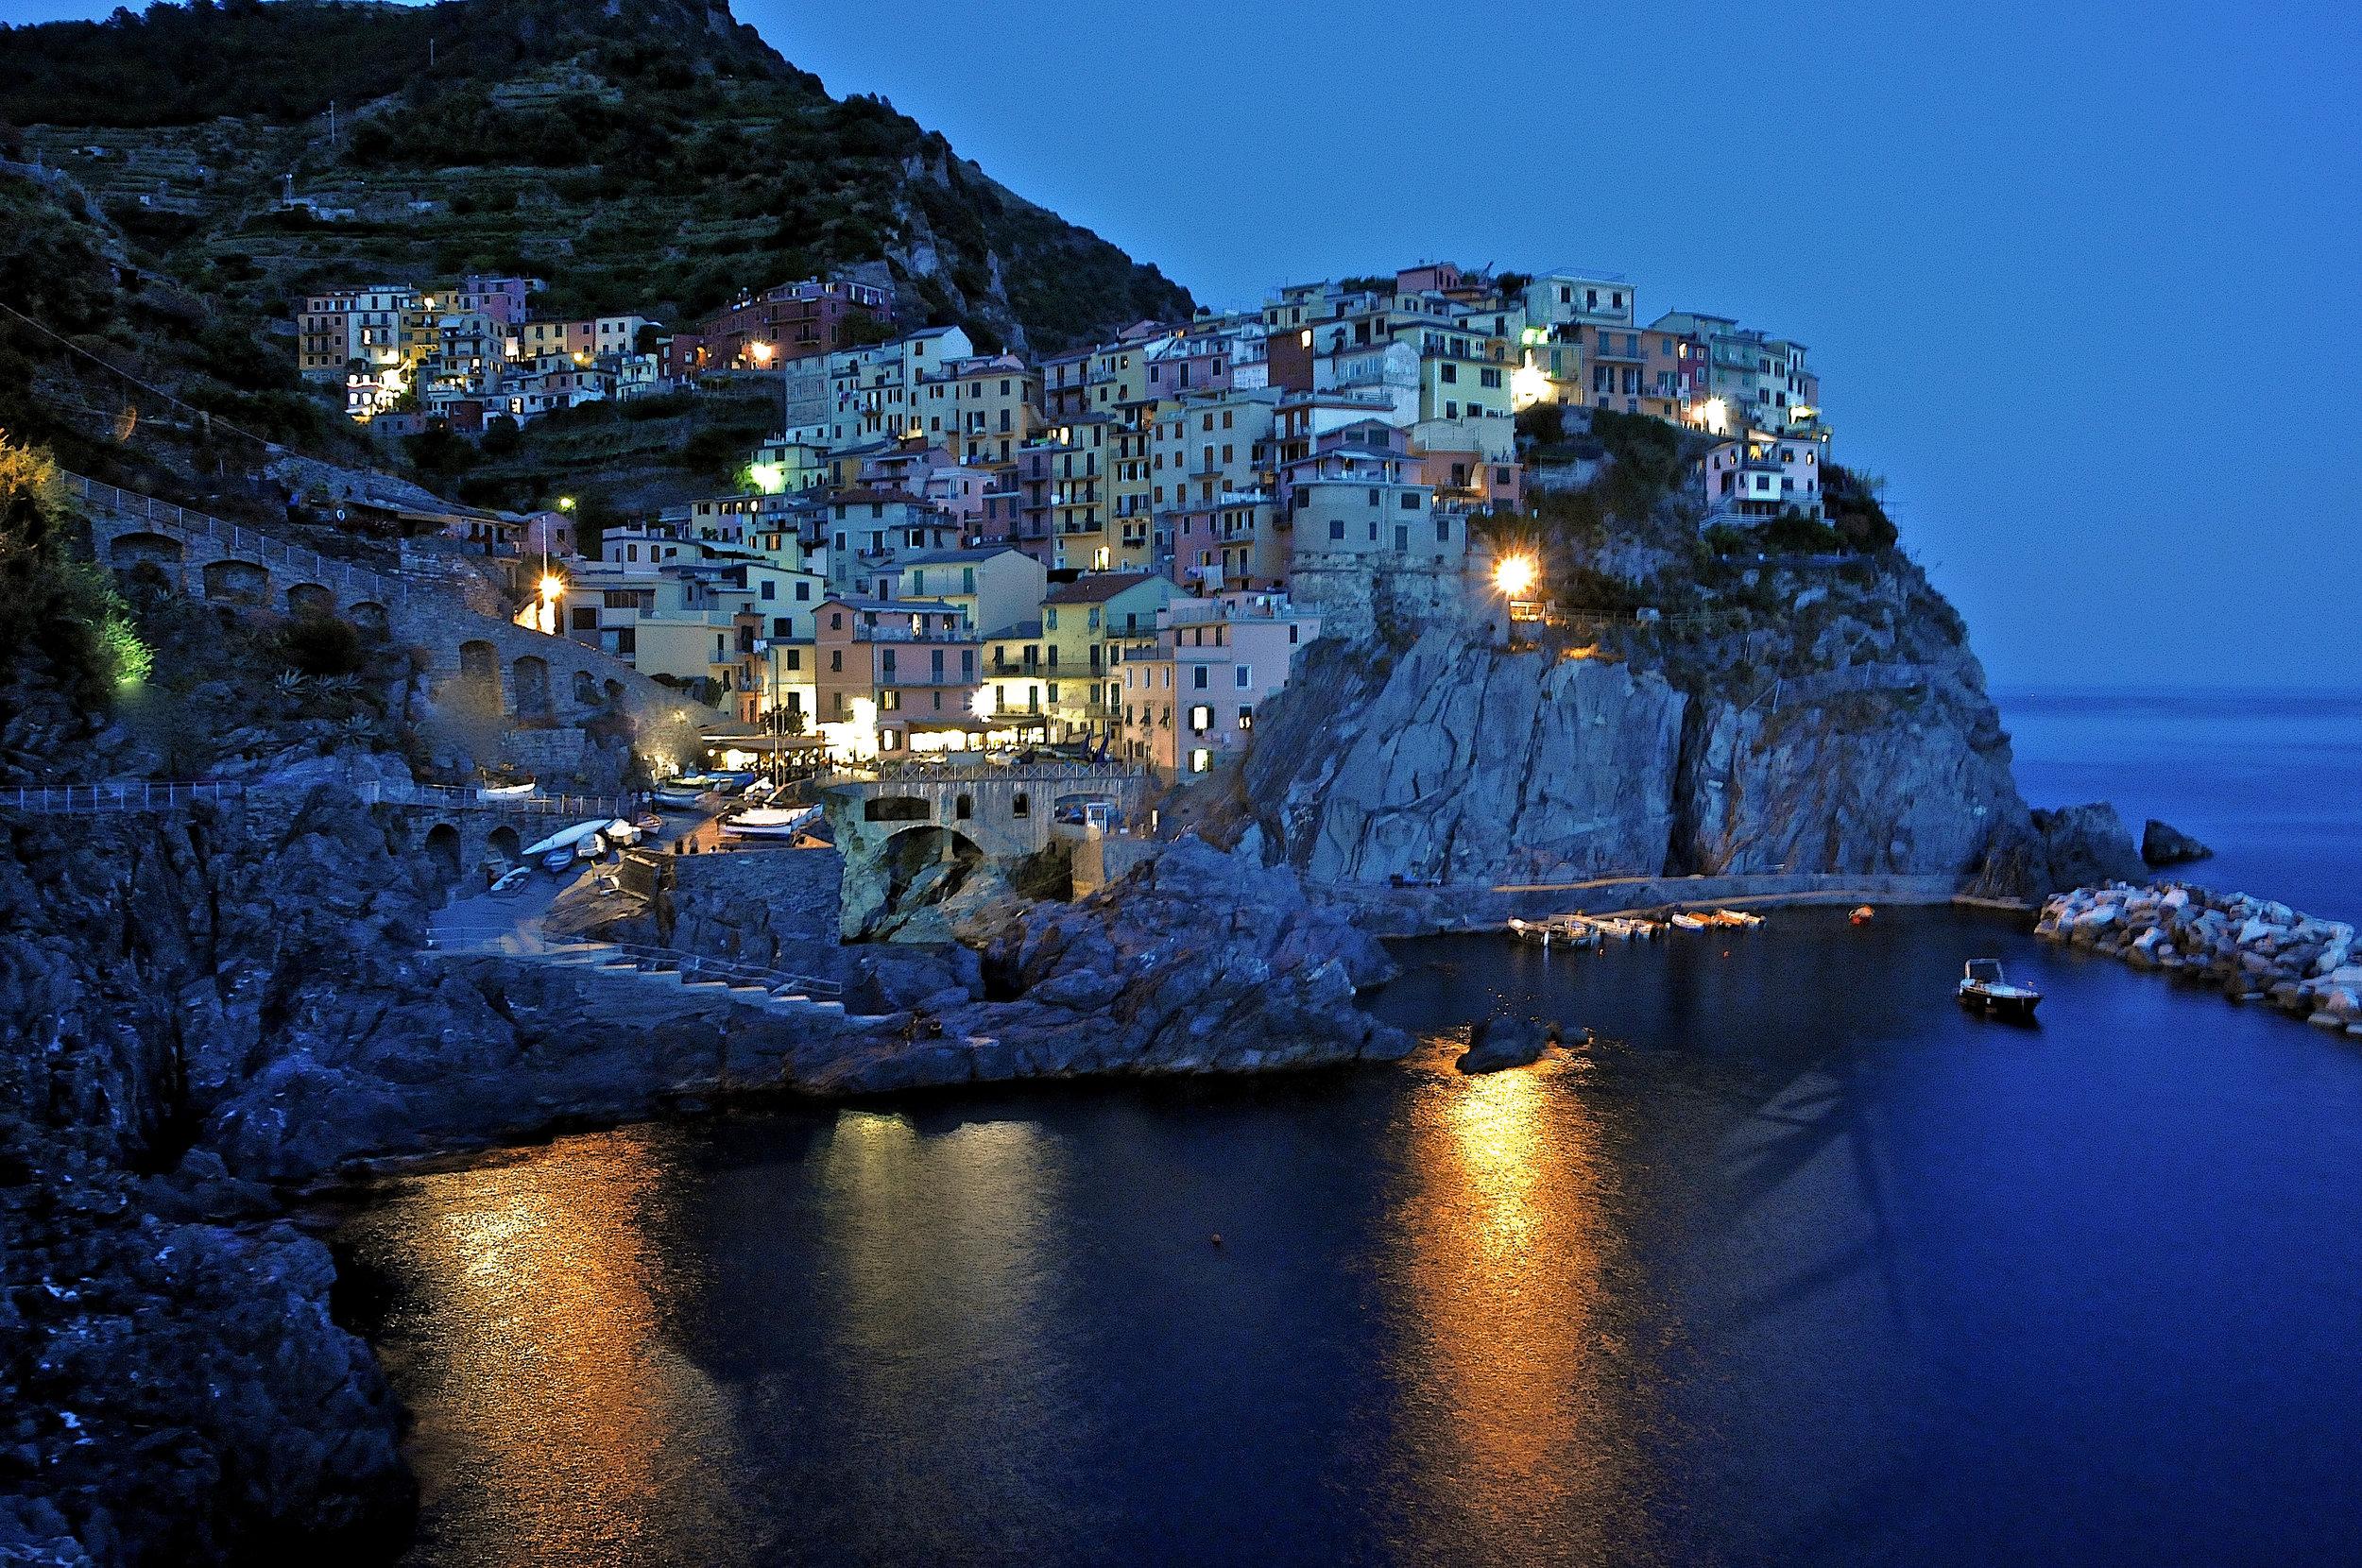 maria poole - Italy 2011 Number 3 077 (1).jpg